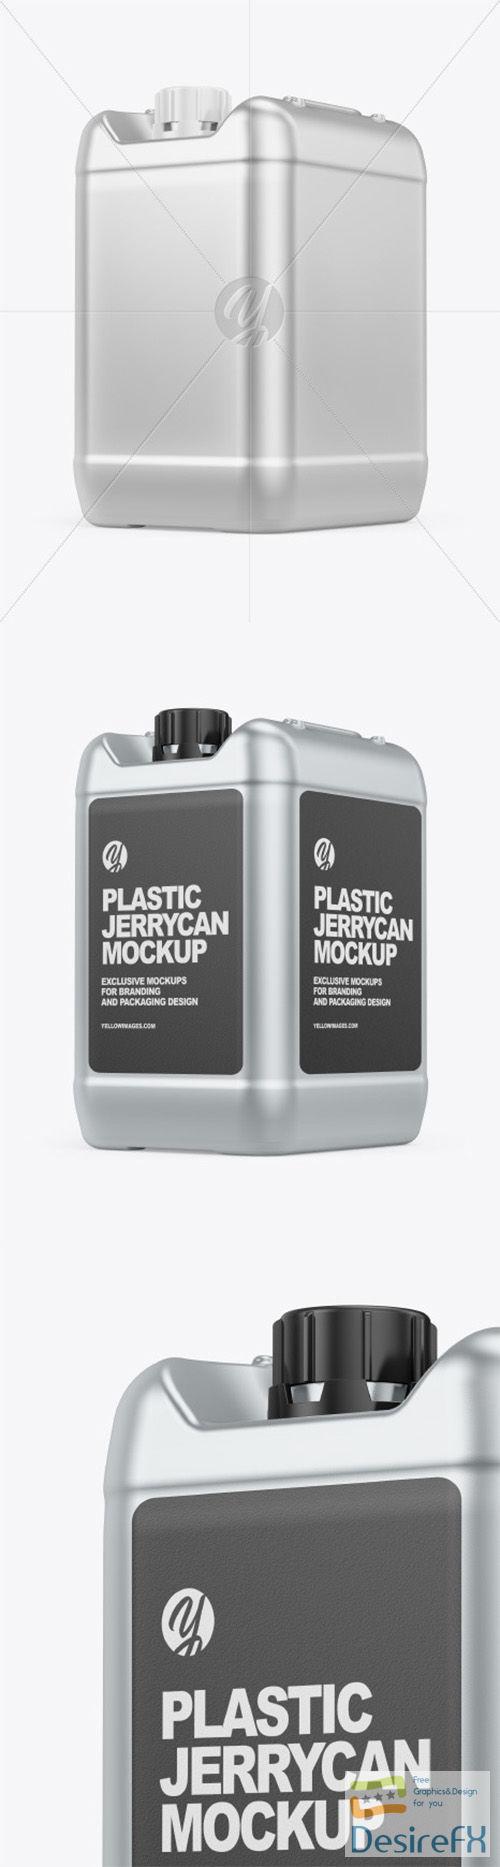 Metallic Jerrycan Mockup 66541